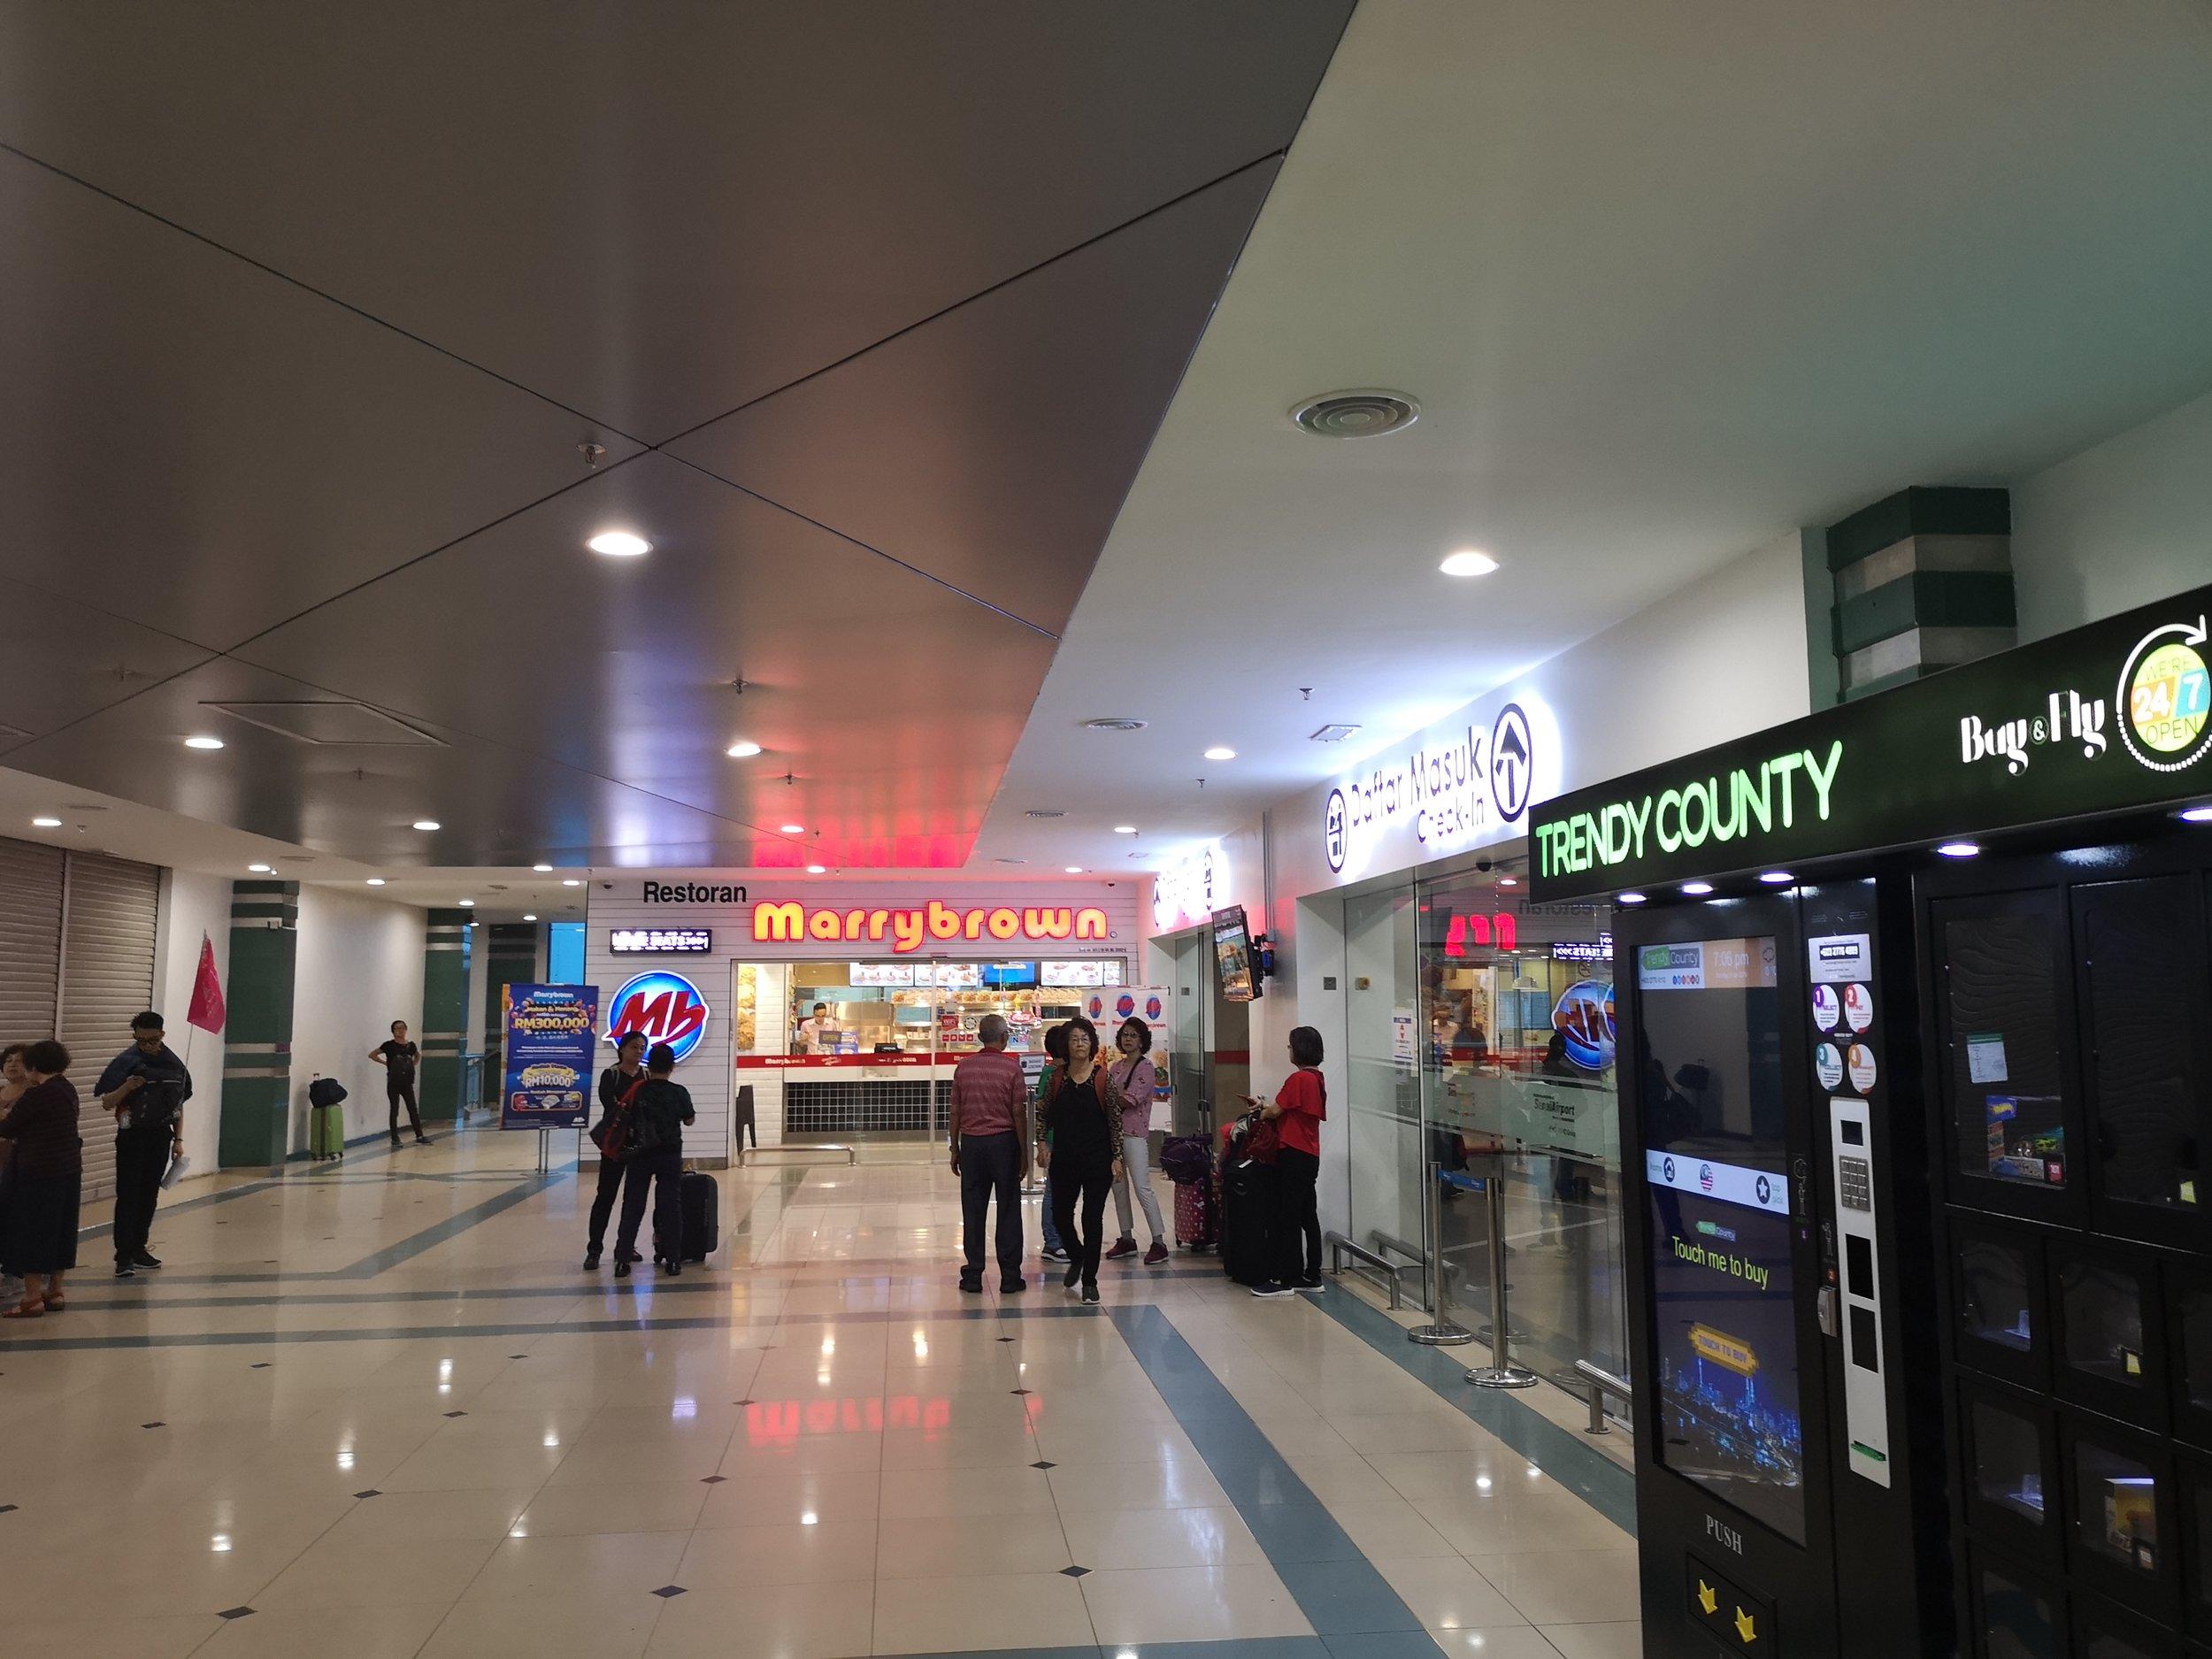 Marybrown Senai Airport